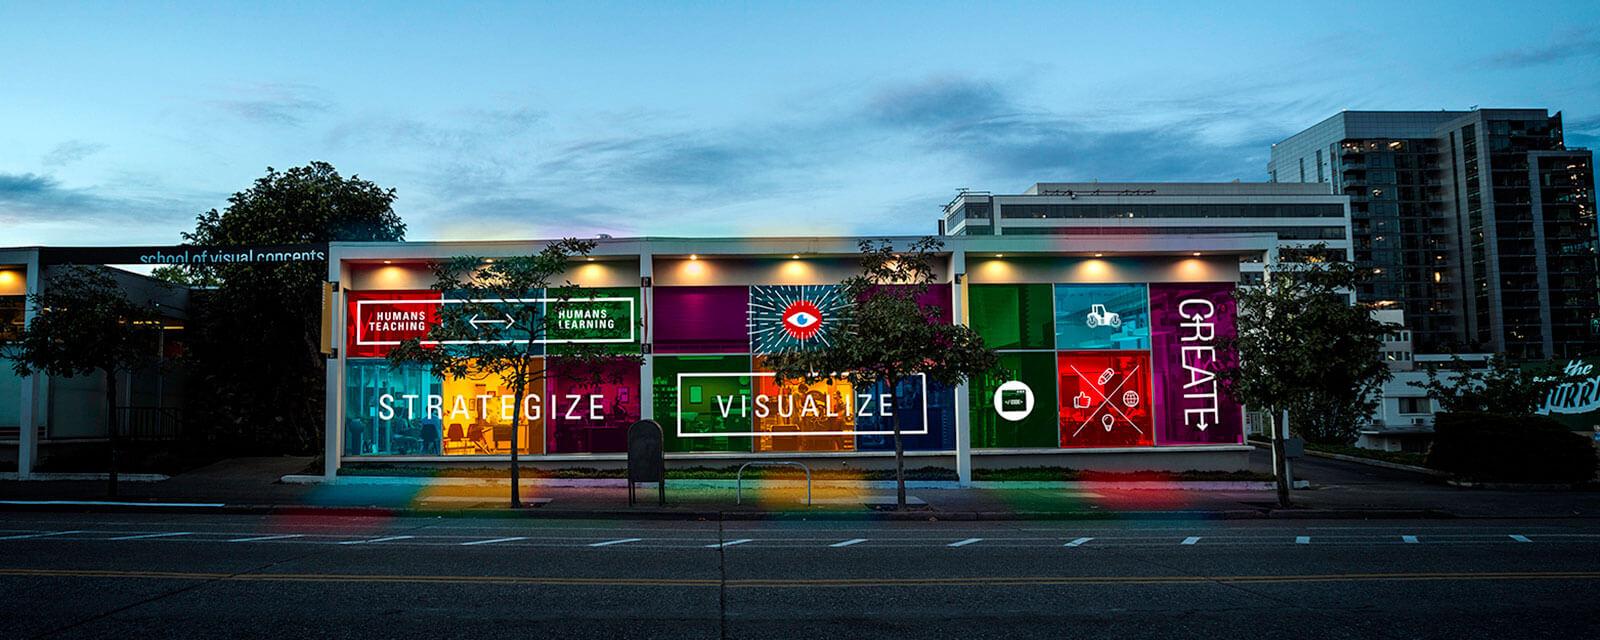 Modular Letterpress Workshop - School of Visual Concepts - Seattle, WANovember 17th, 2019 - 10:00 AM - 5:00PM